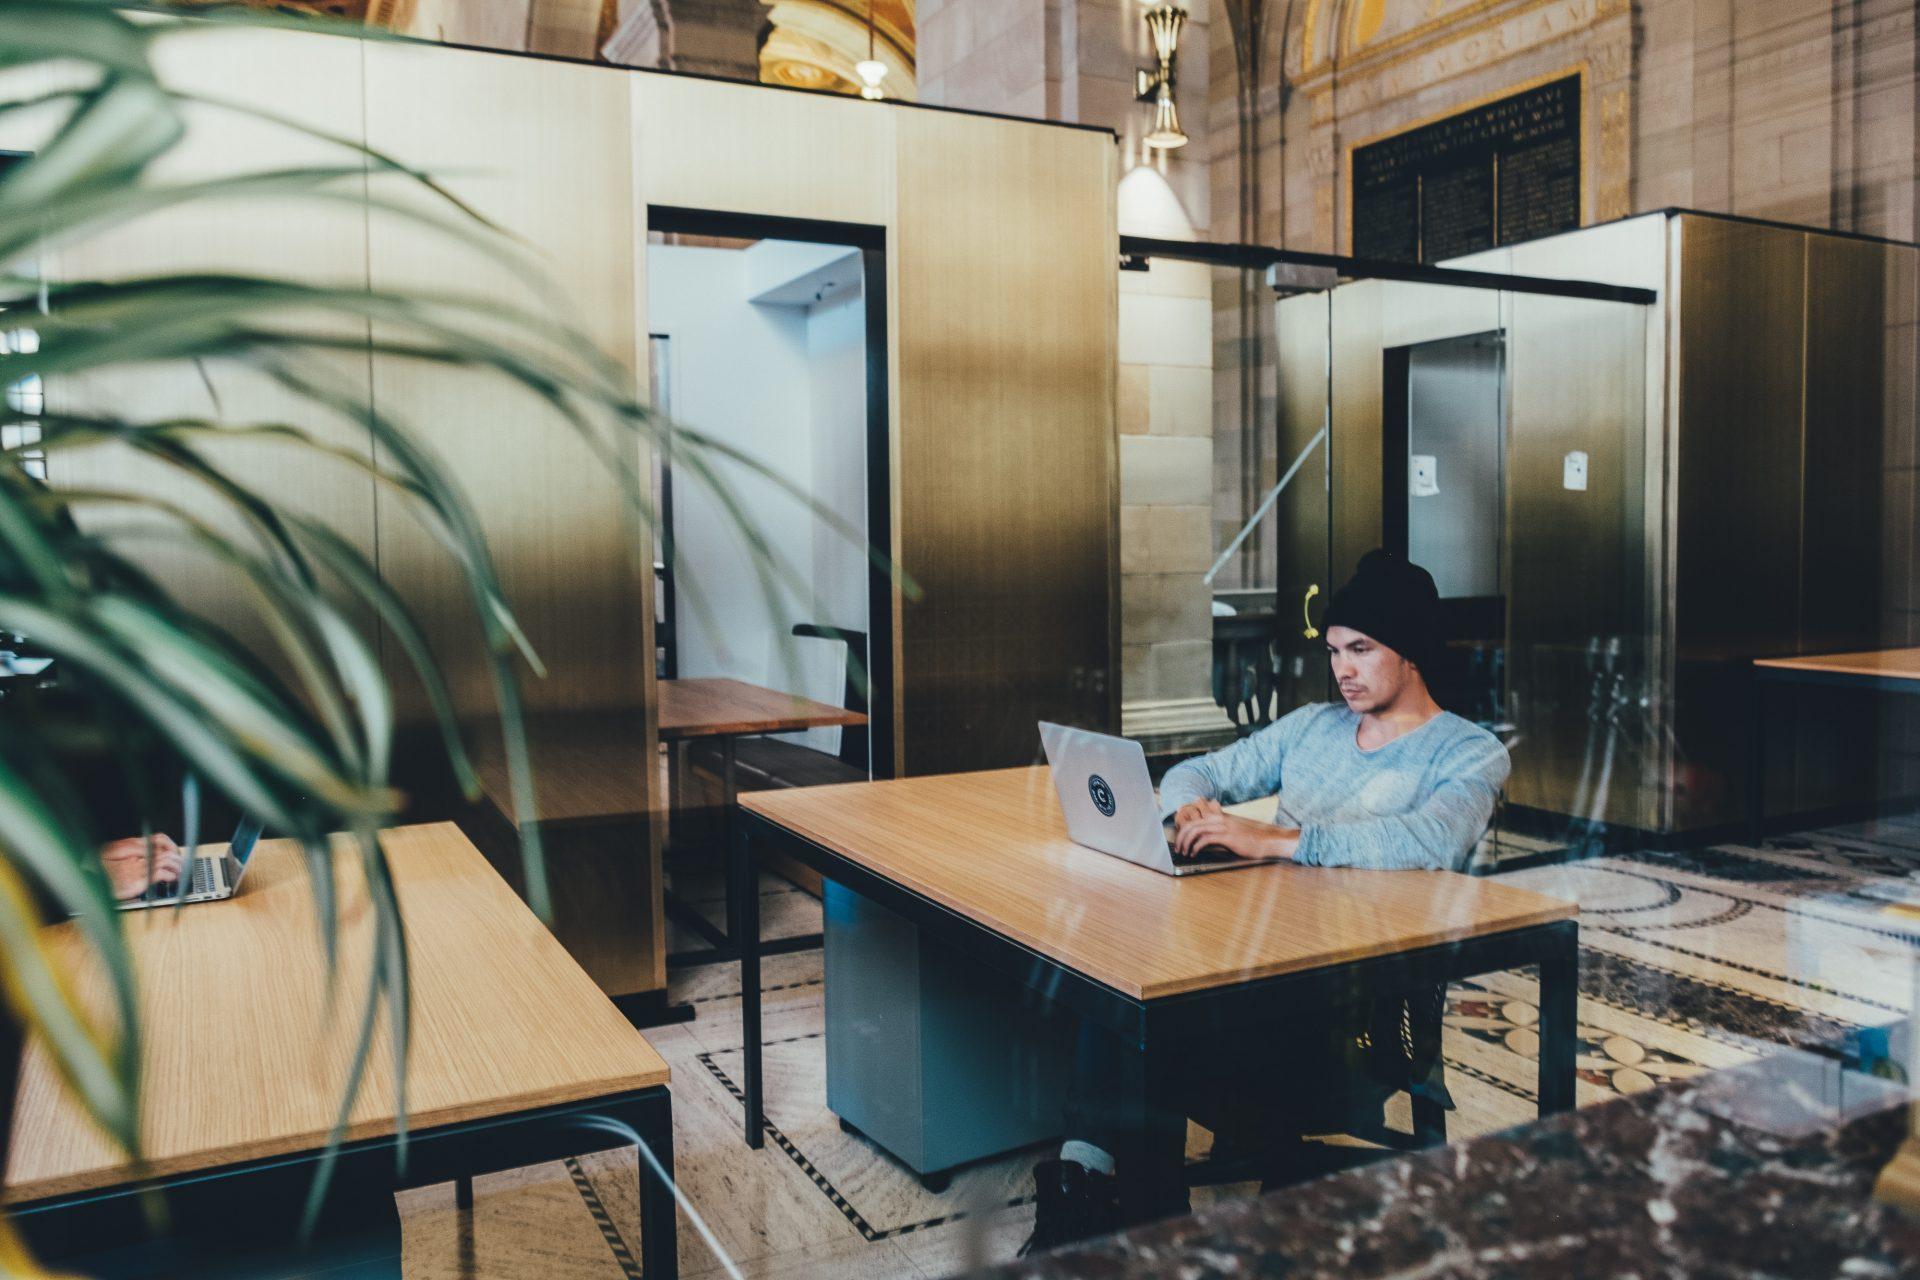 454547fc6a92f kancelaria-zamestnanec-muz-notebook-maly-priestor-stol-nabytok-